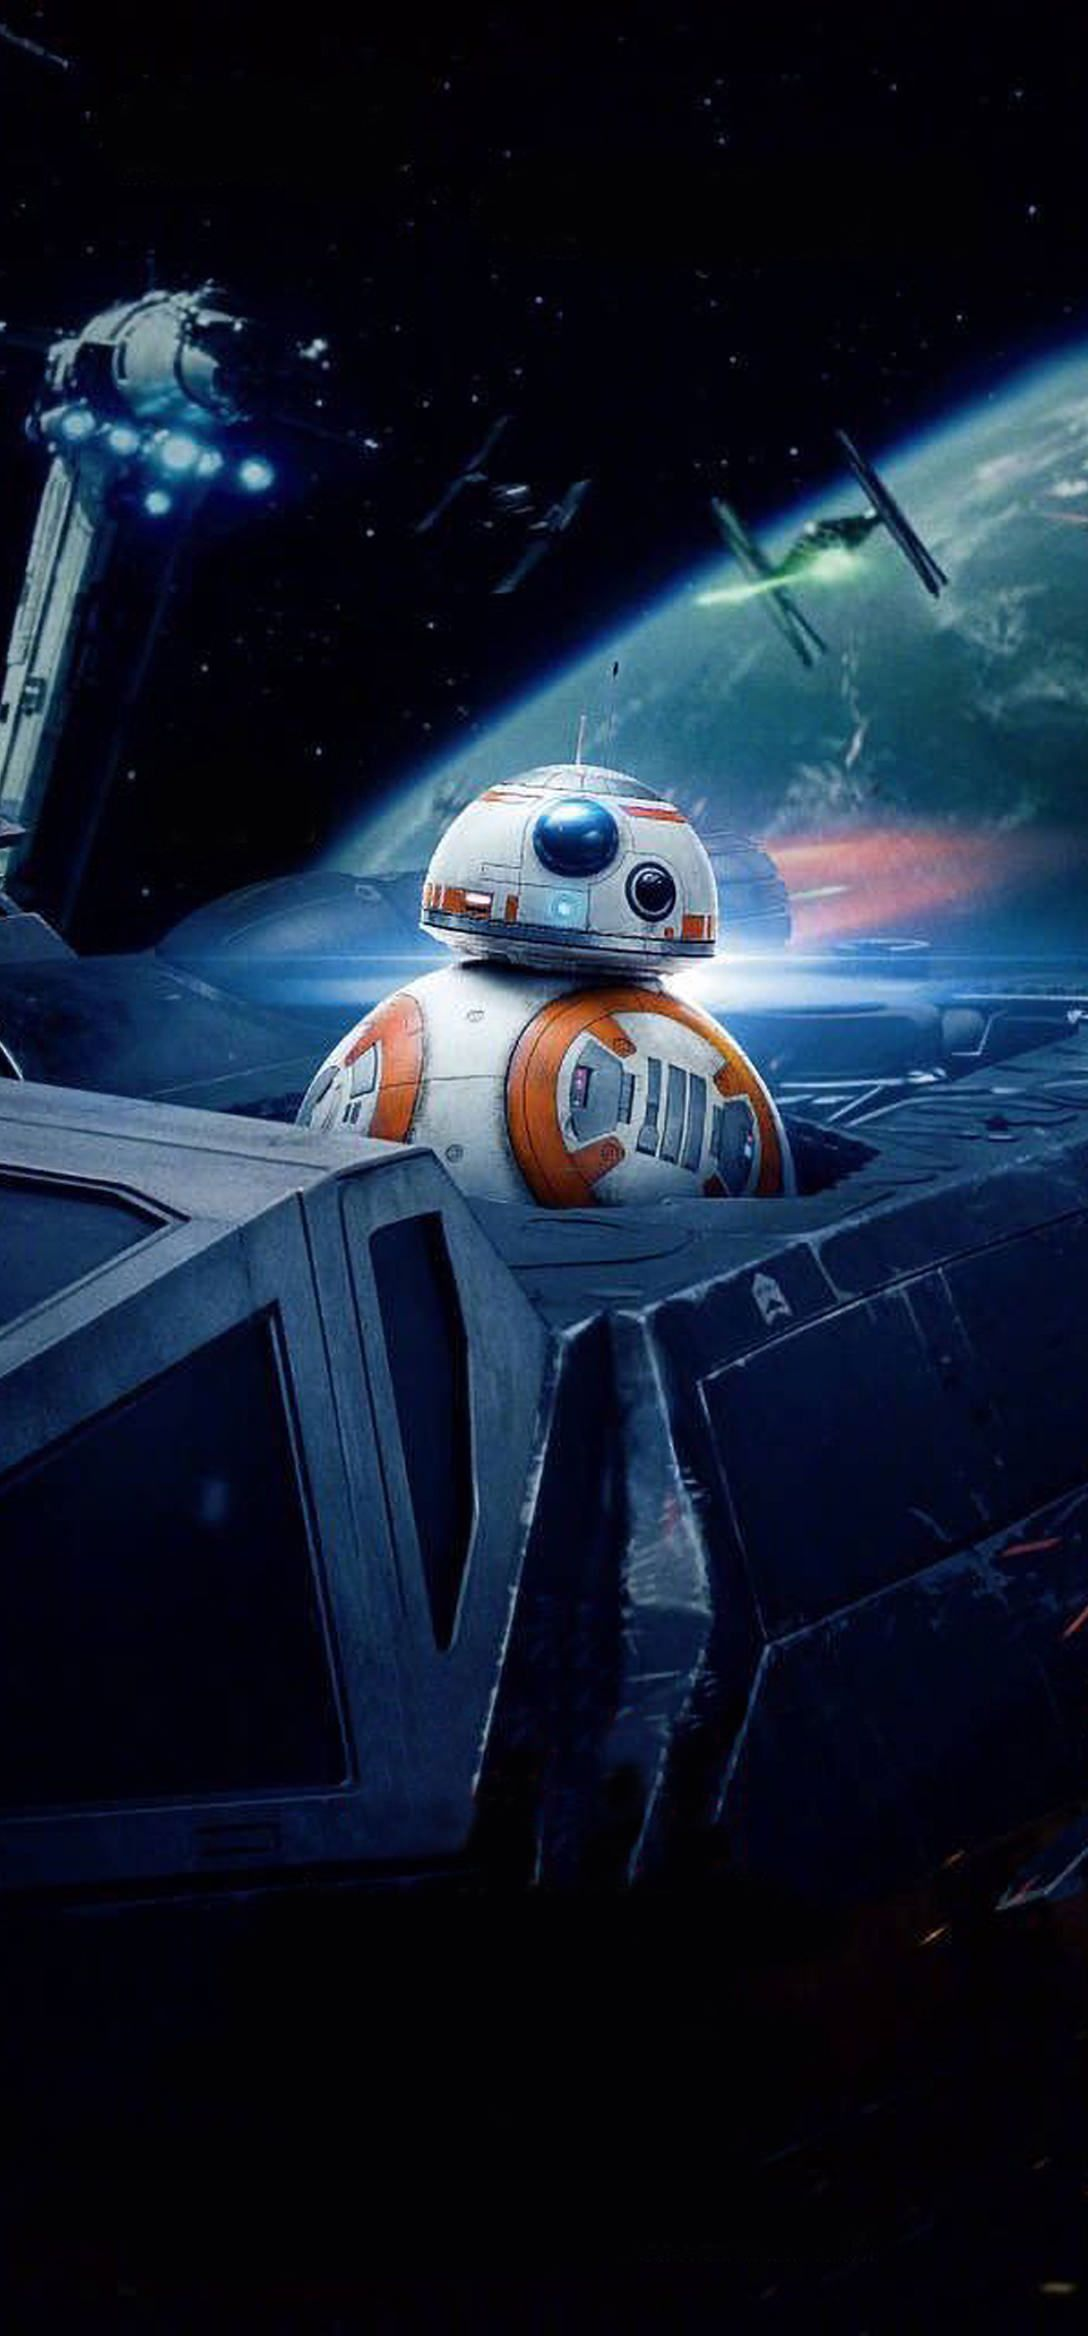 Star Wars Wallpaper 4k Iphone